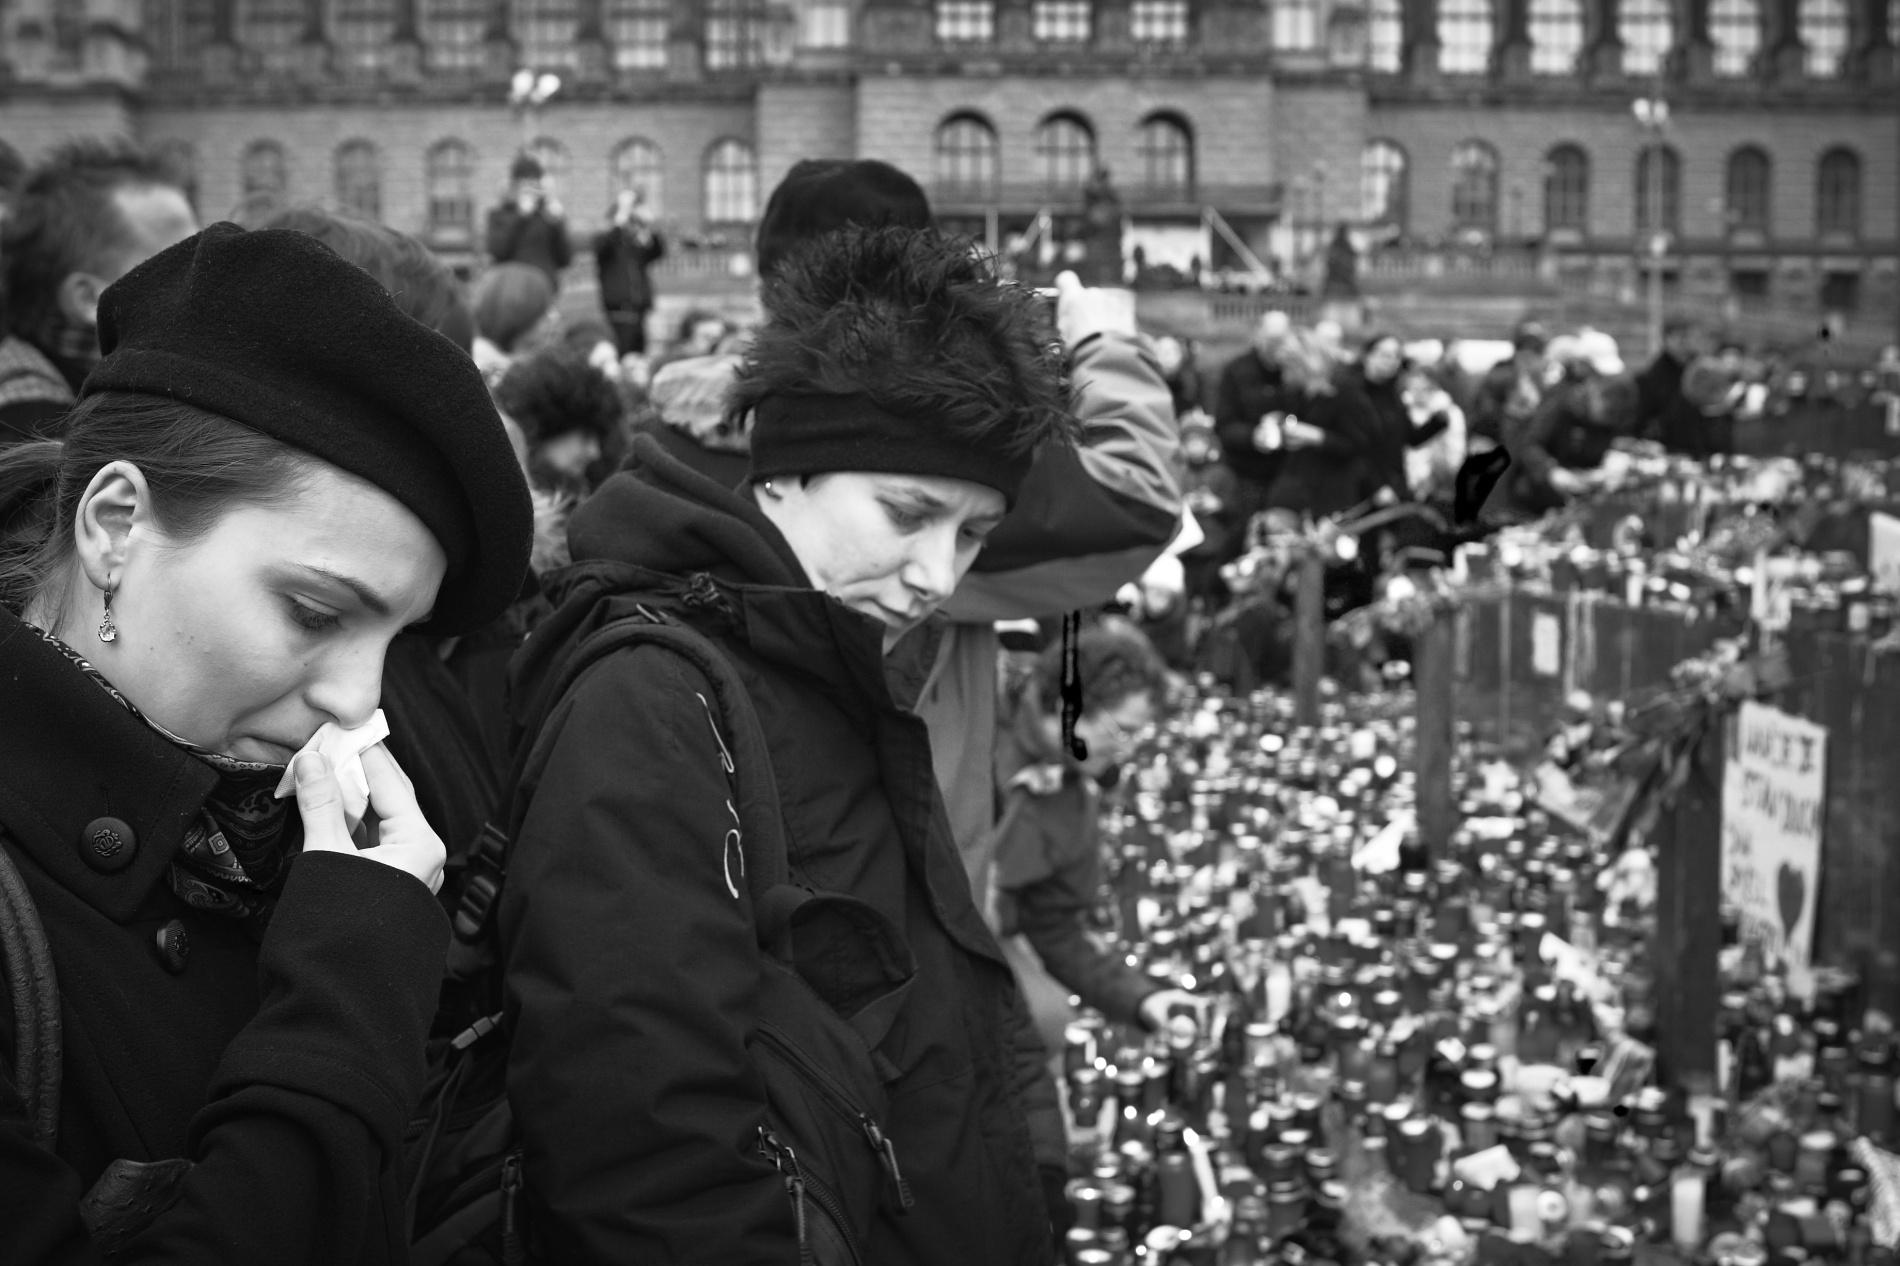 Den_rozlouceni_23.12.2011_44